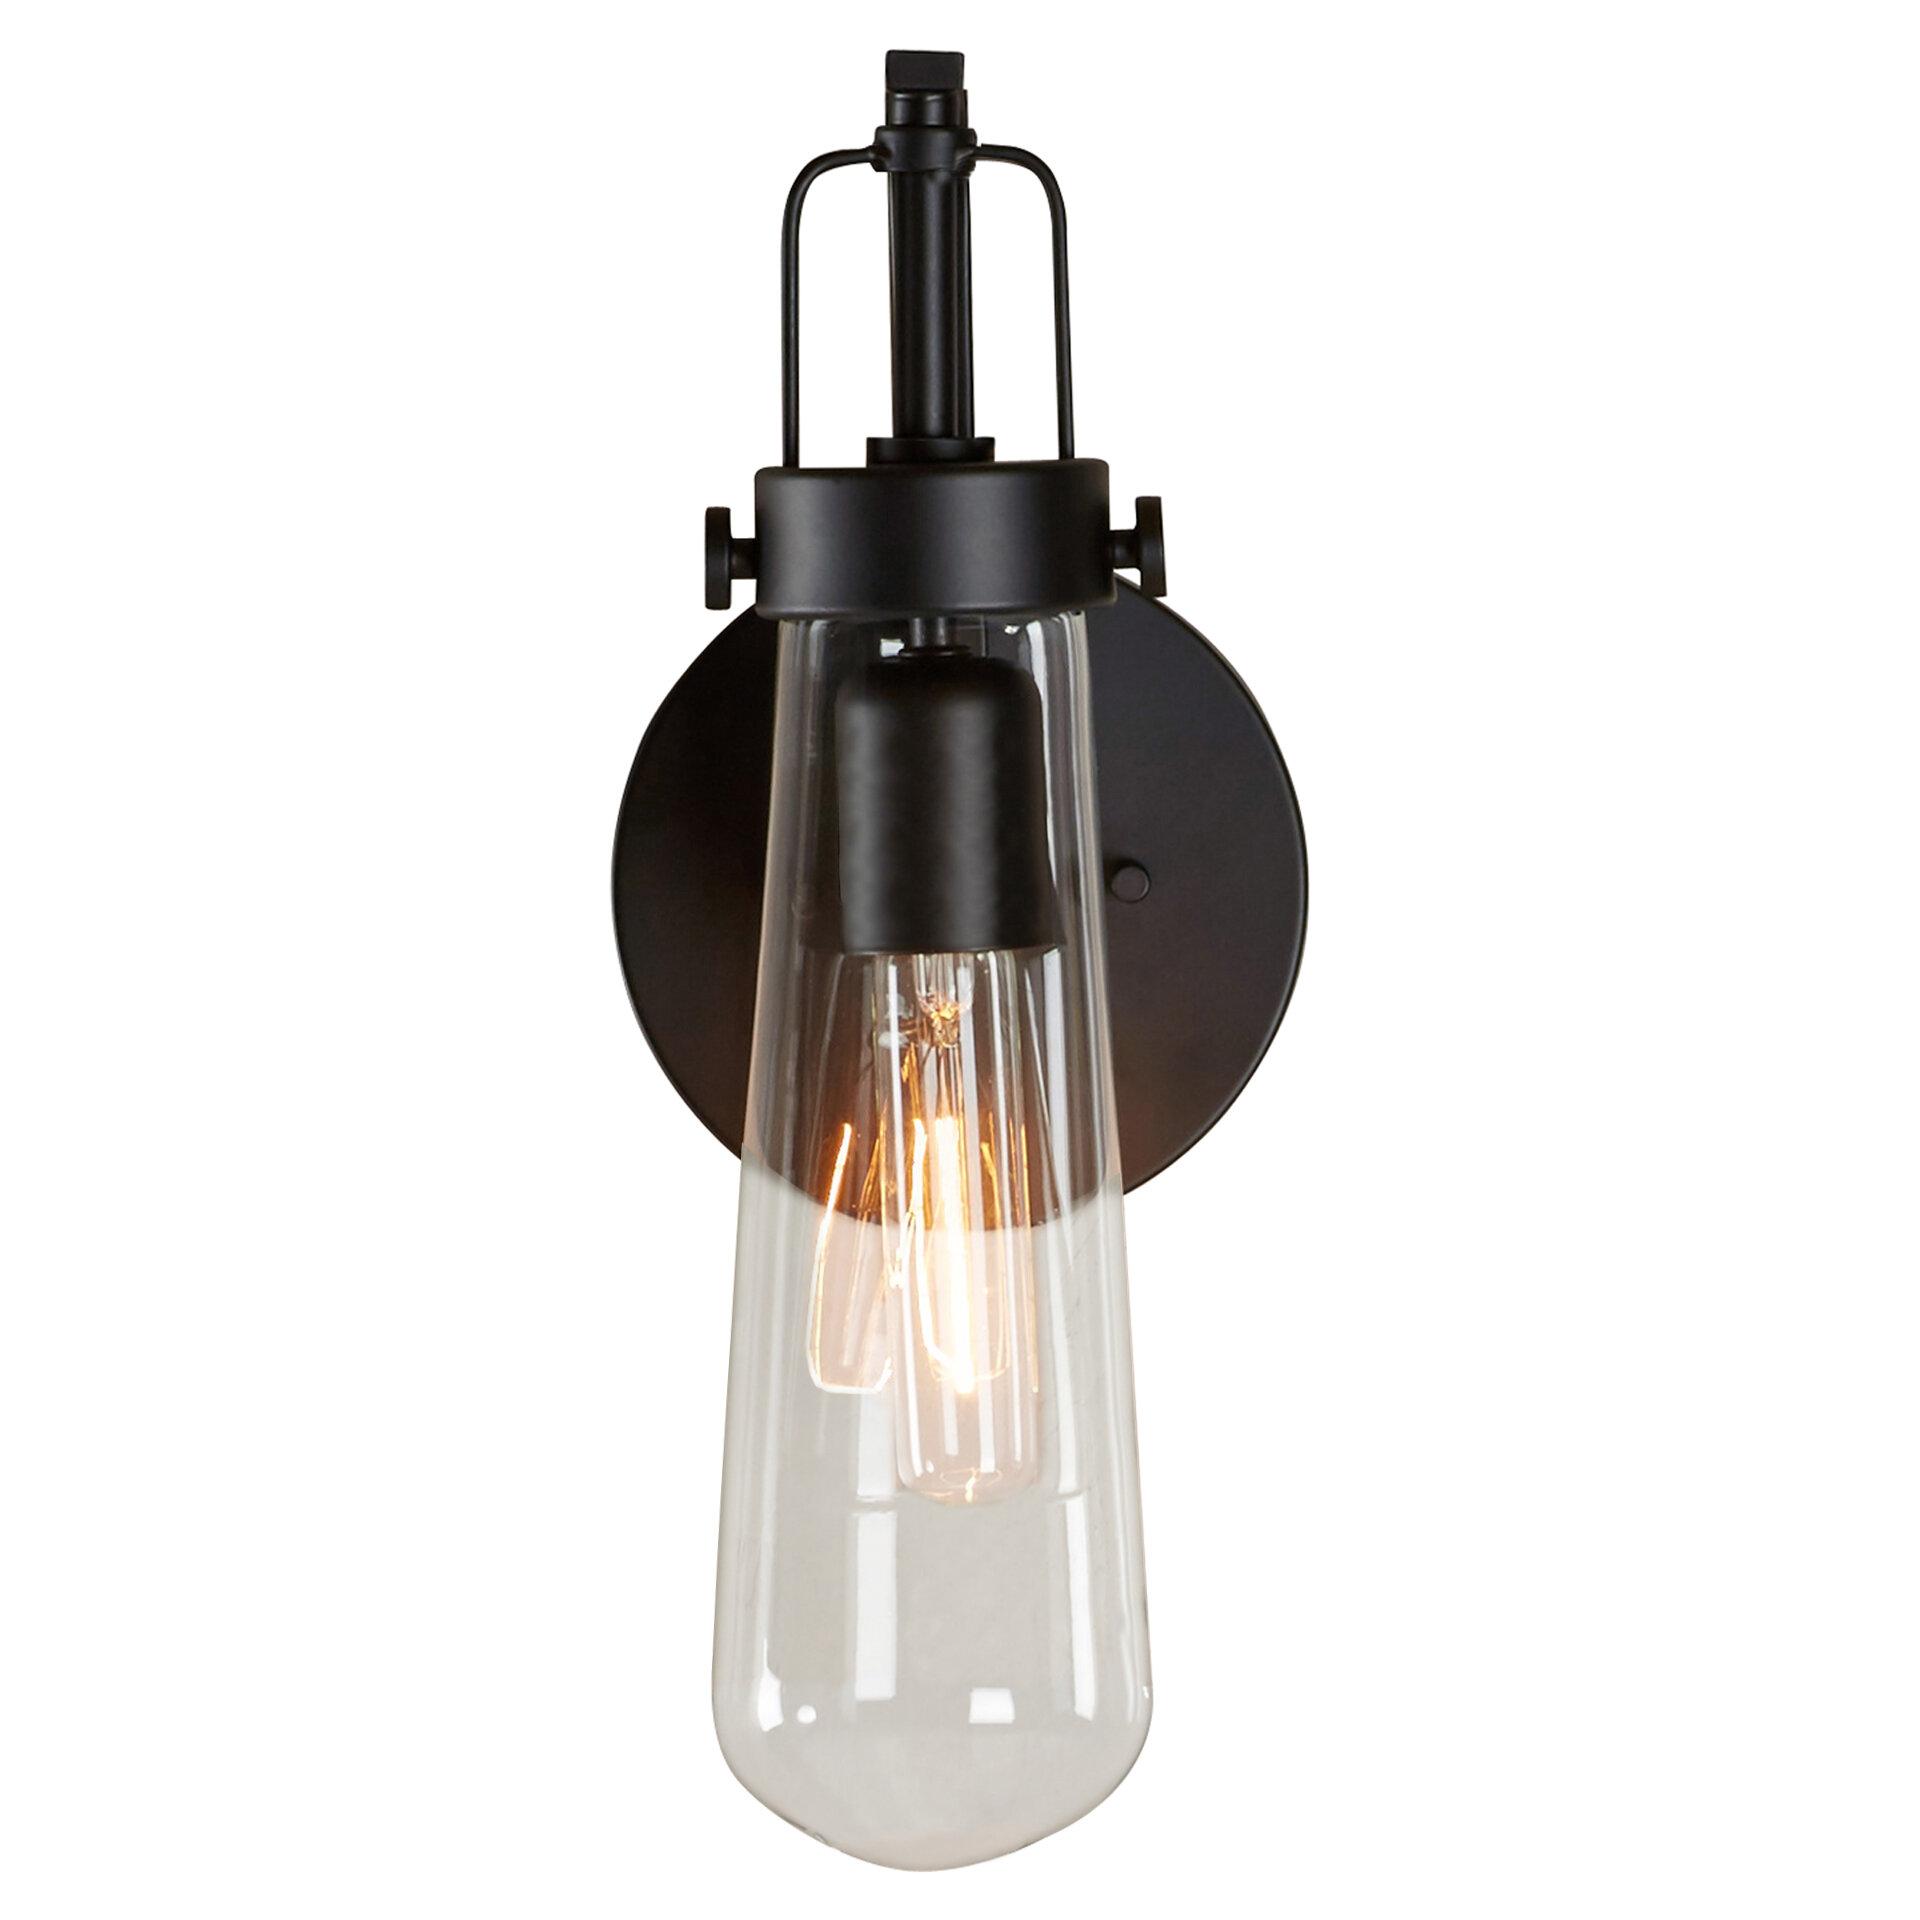 led sconce light wall mounted trent austin design alguno 1light led armed sconce reviews wayfair